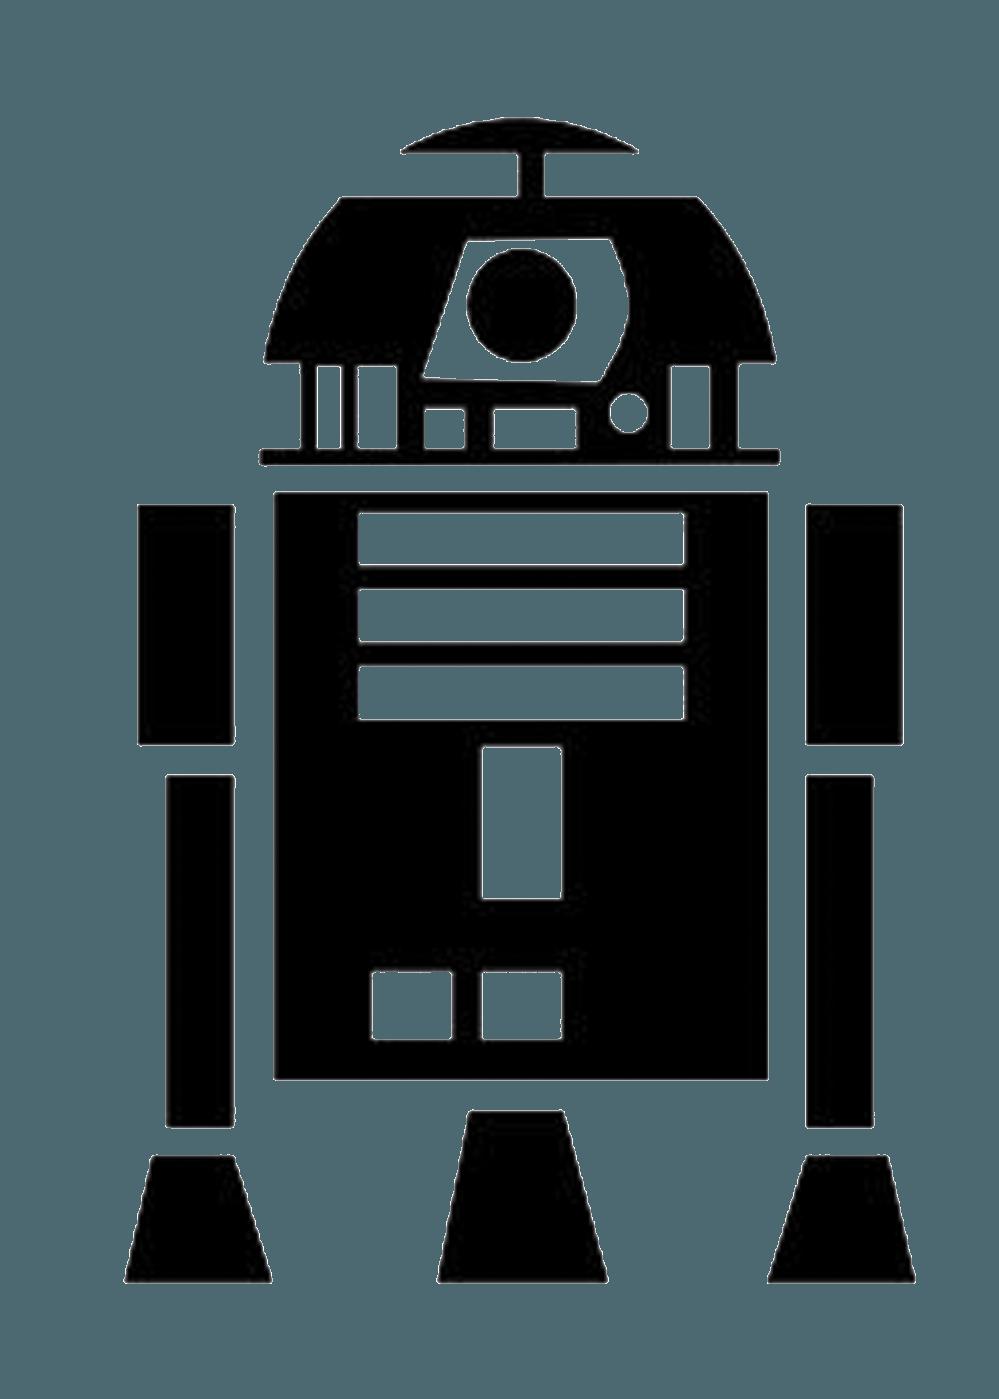 Star wars stencil clipart vector free stock Star Wars Wall Art | Cricut, Star and Crafty vector free stock